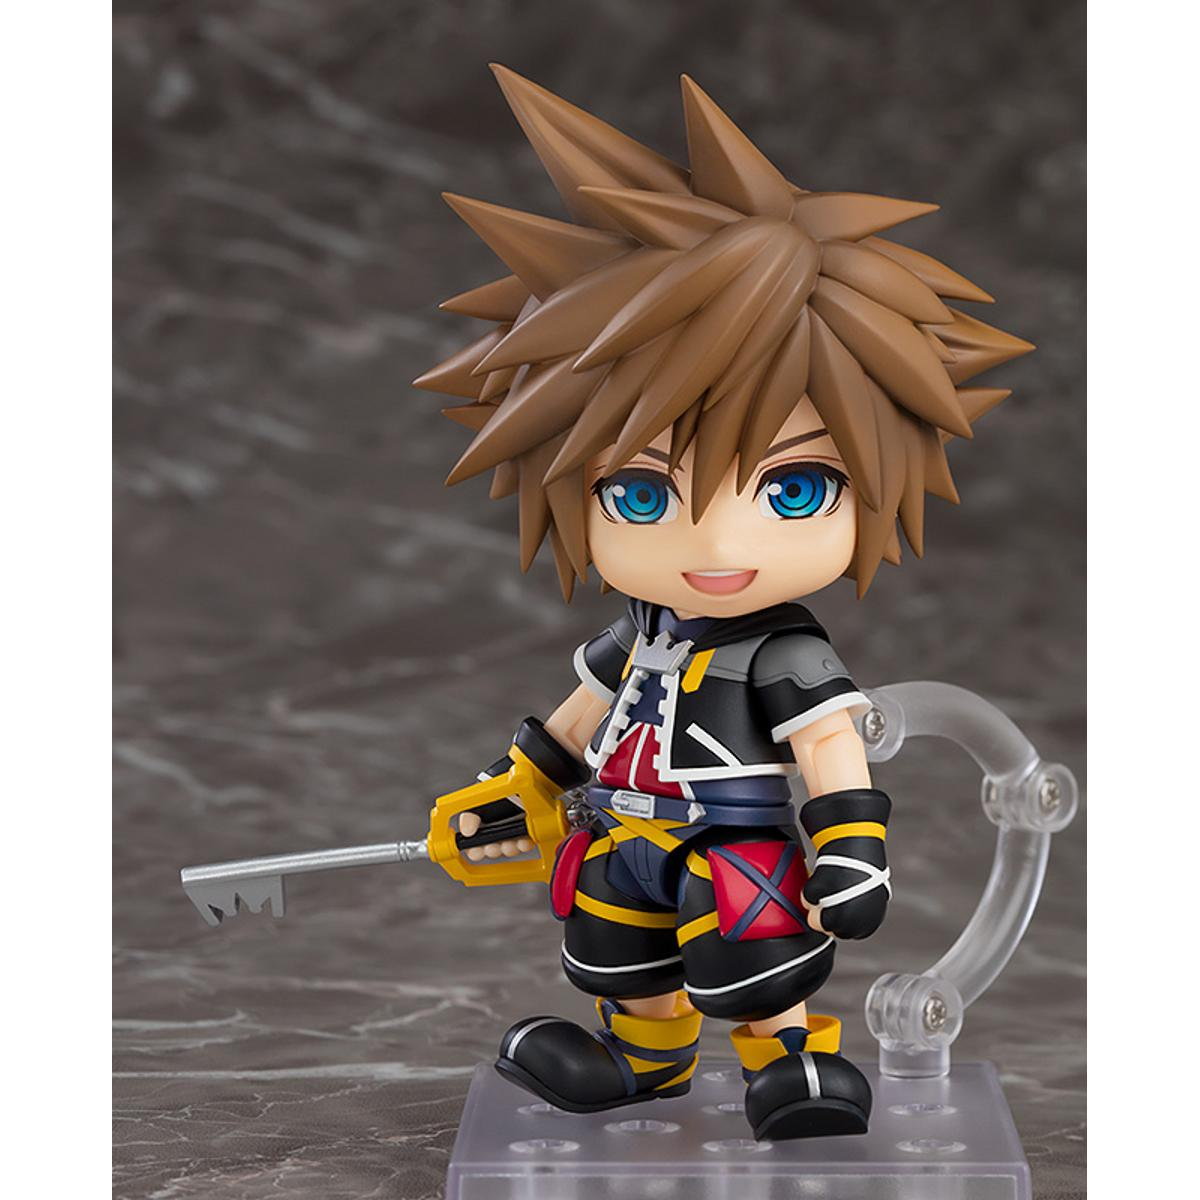 Nendoroid Sora: Kingdom Hearts II Ver.